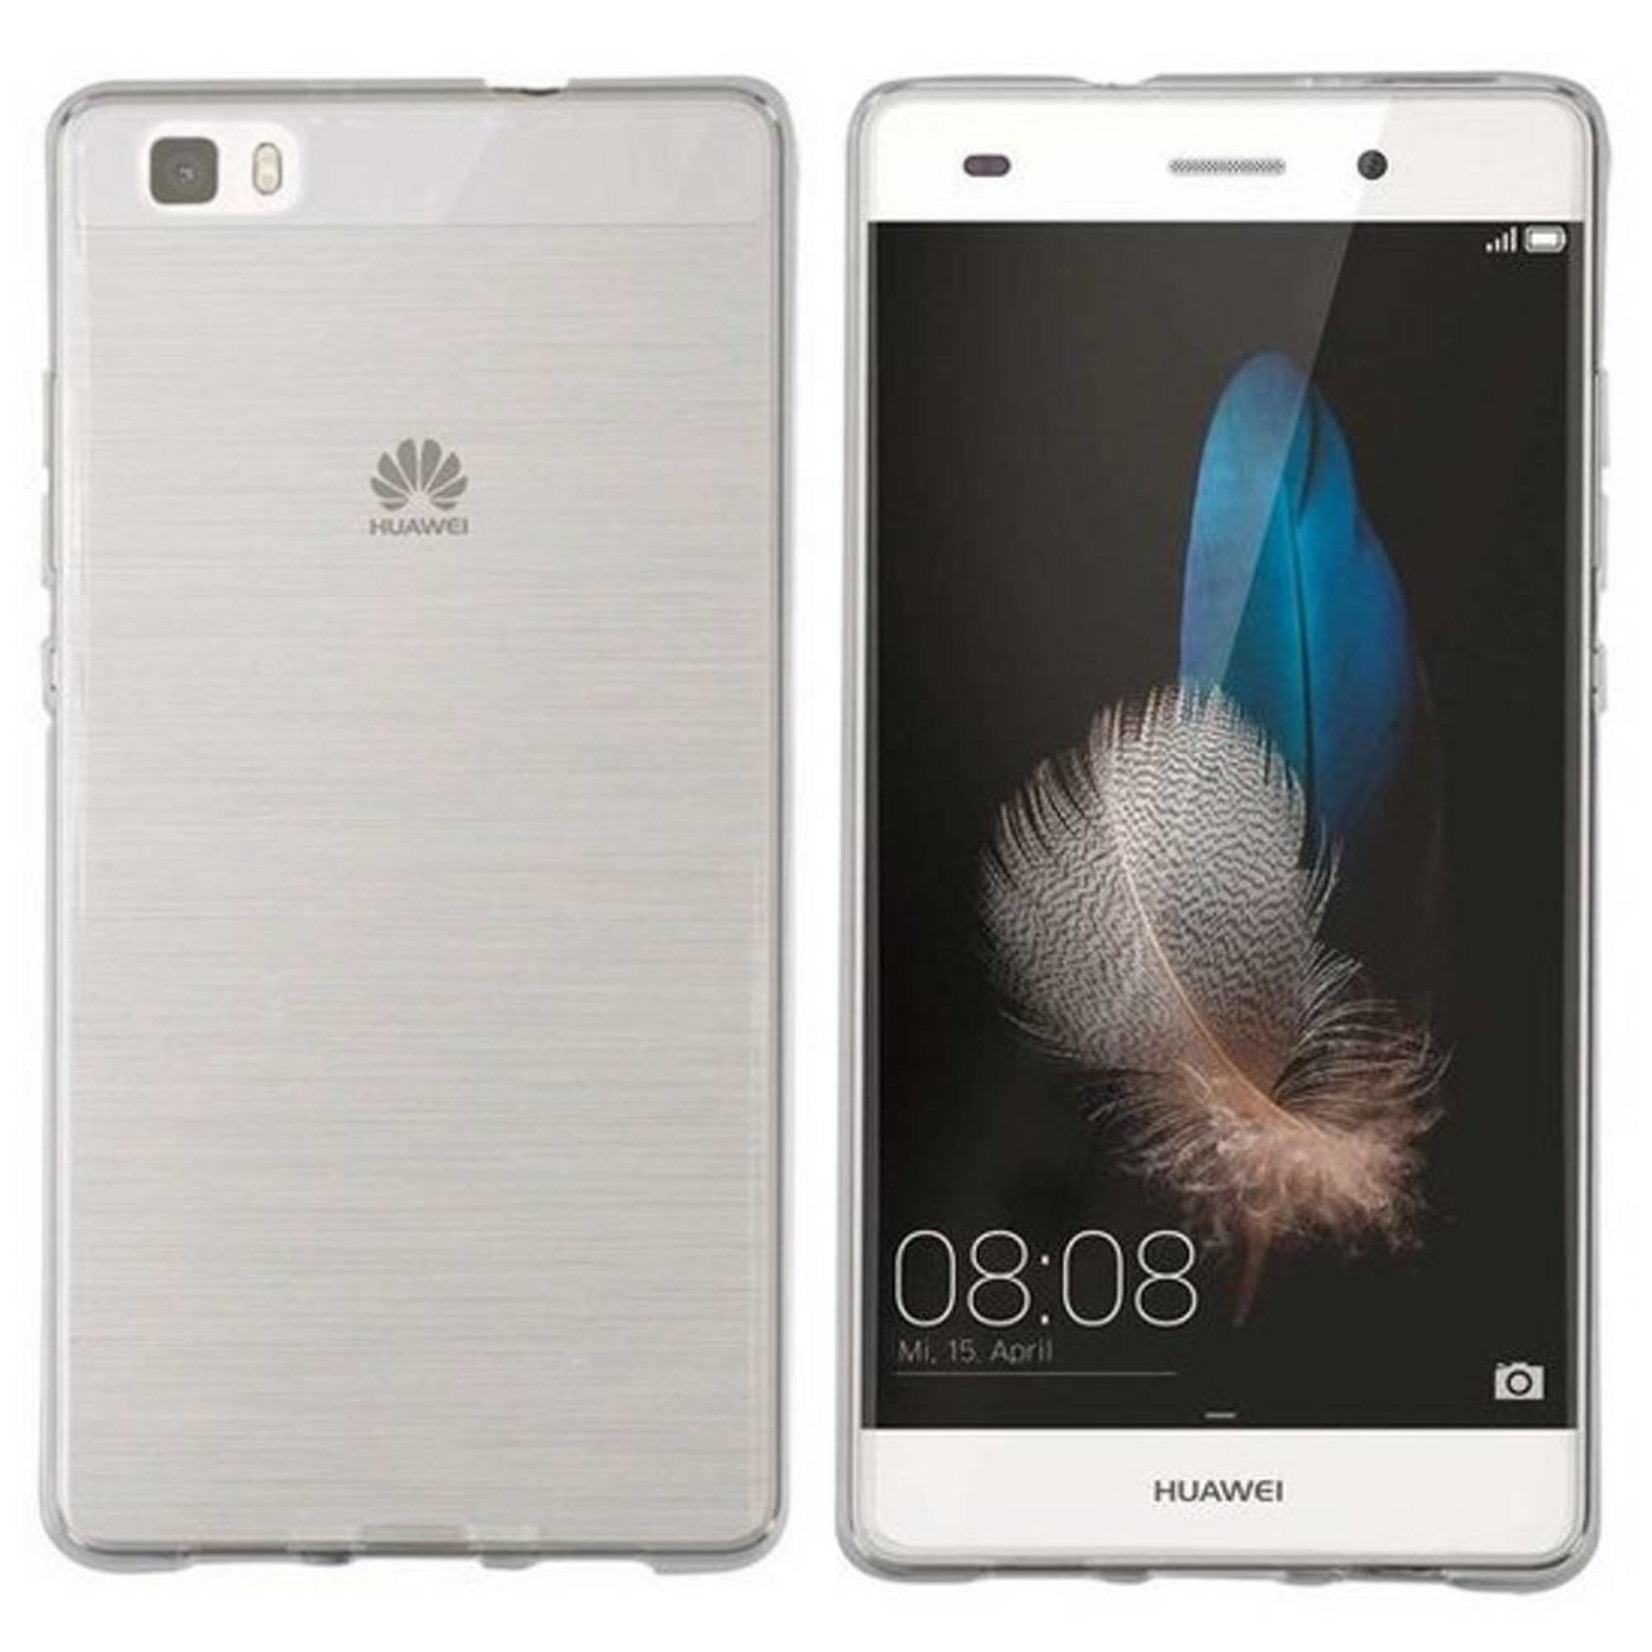 Colorfone Hoesje CoolSkin3T voor Huawei P8 Lite Tr. Wit